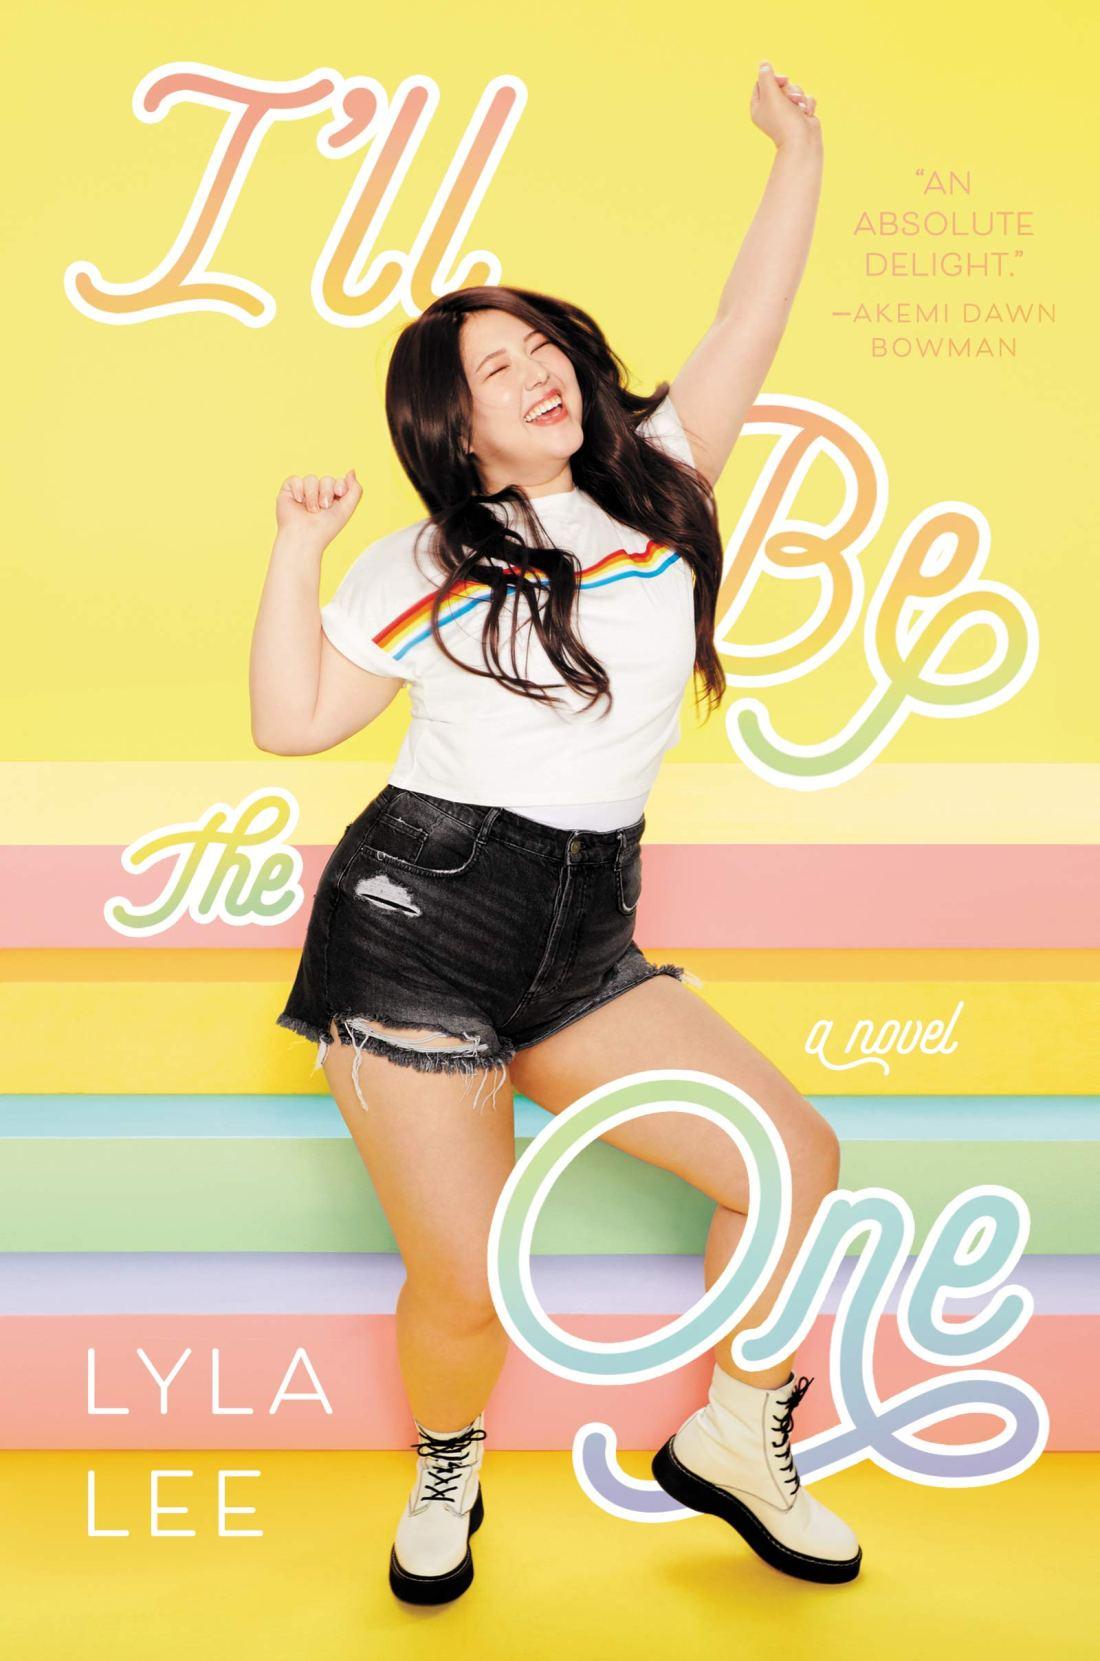 Amazon.com: I'll Be the One (9780062936929): Lee, Lyla: Books